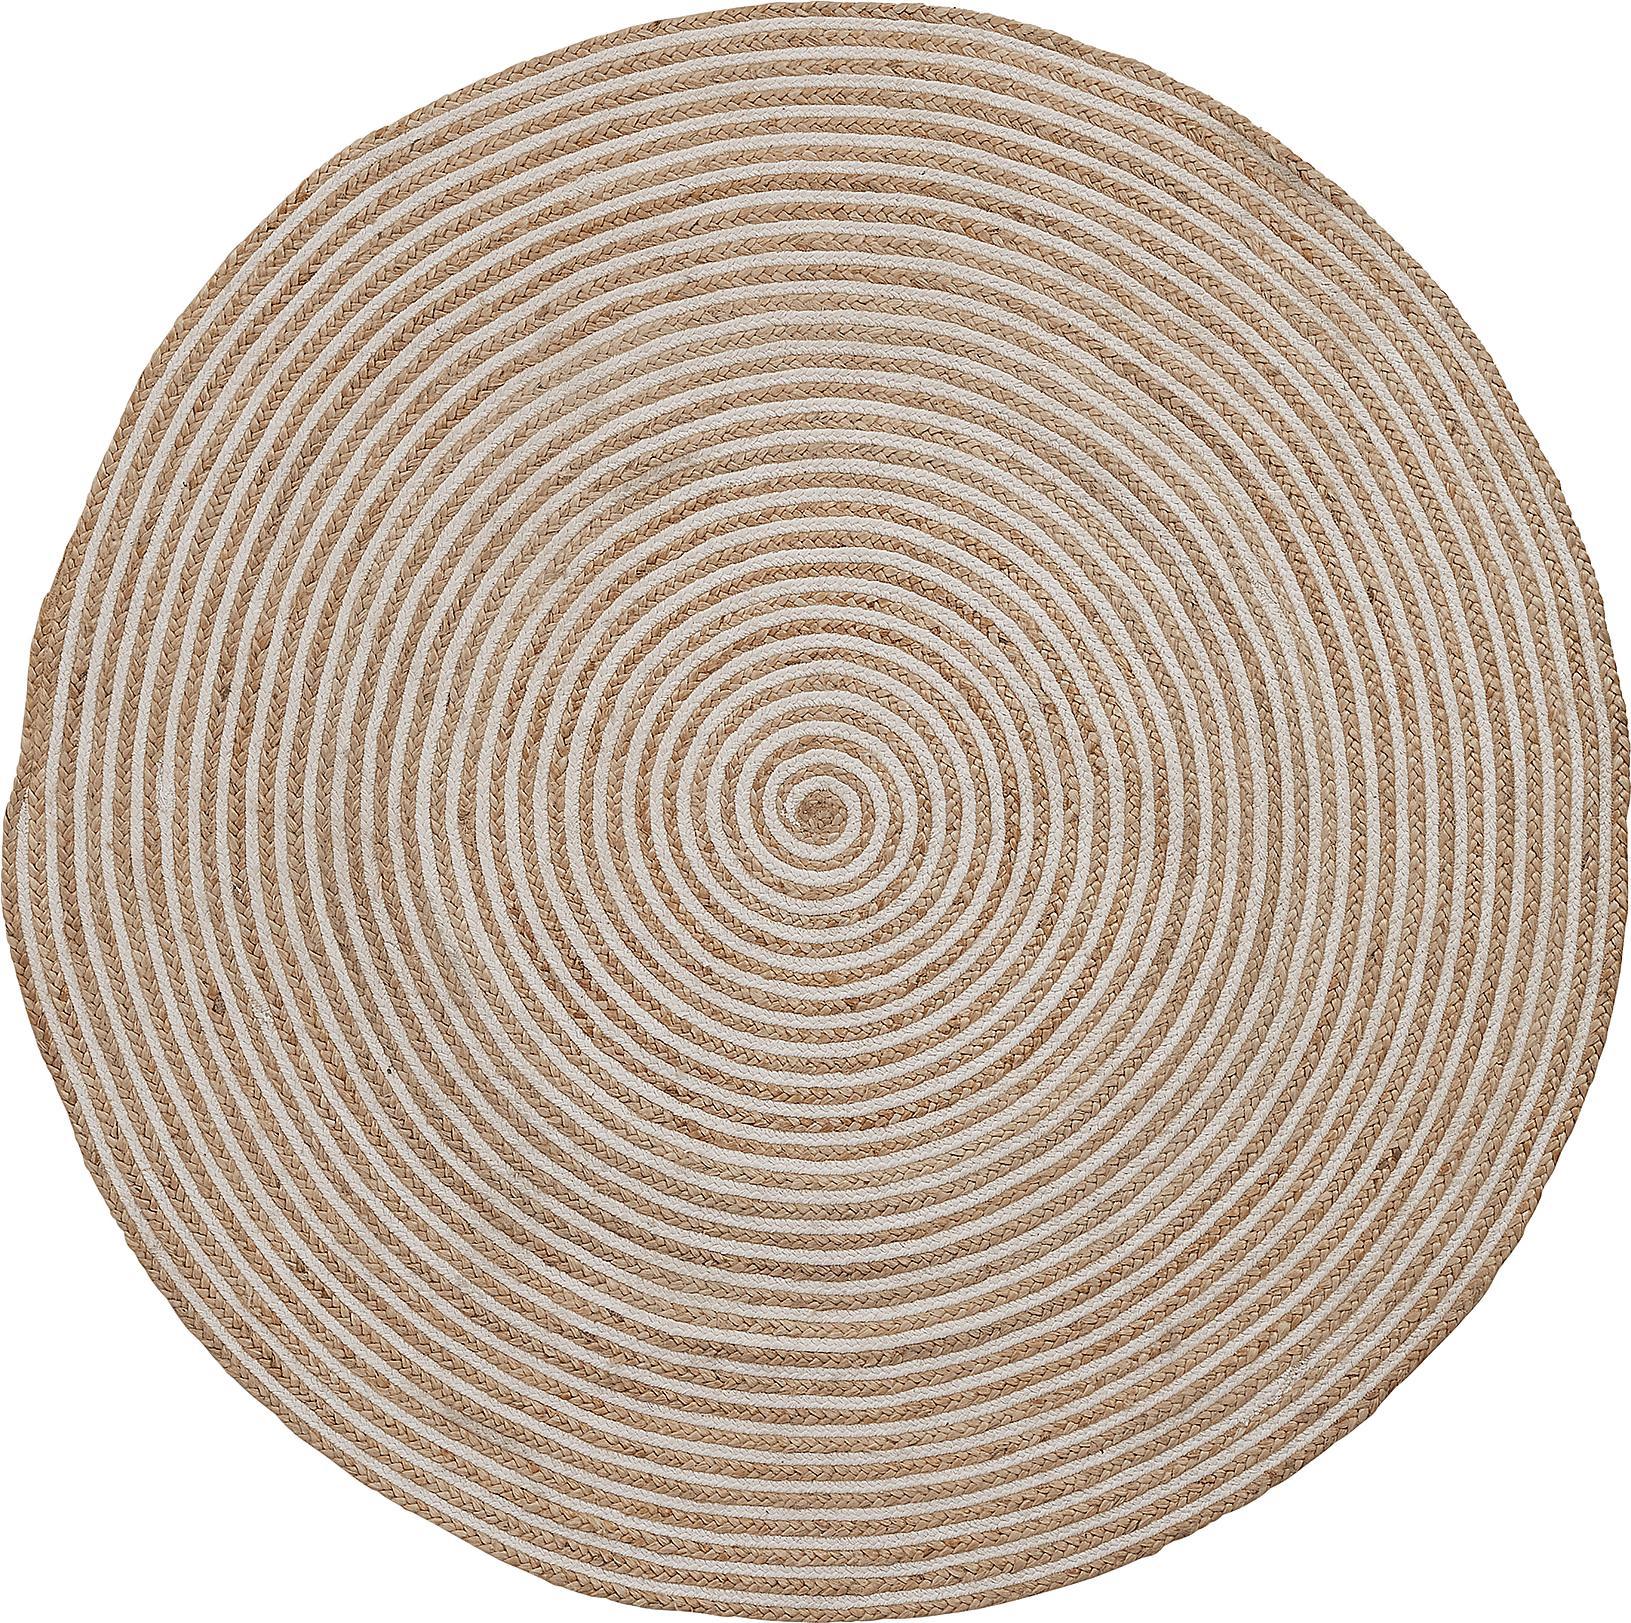 Tappeto rotondo in juta Samy, Fibra naturale, Beige, bianco, Ø 100 cm (taglia XS)